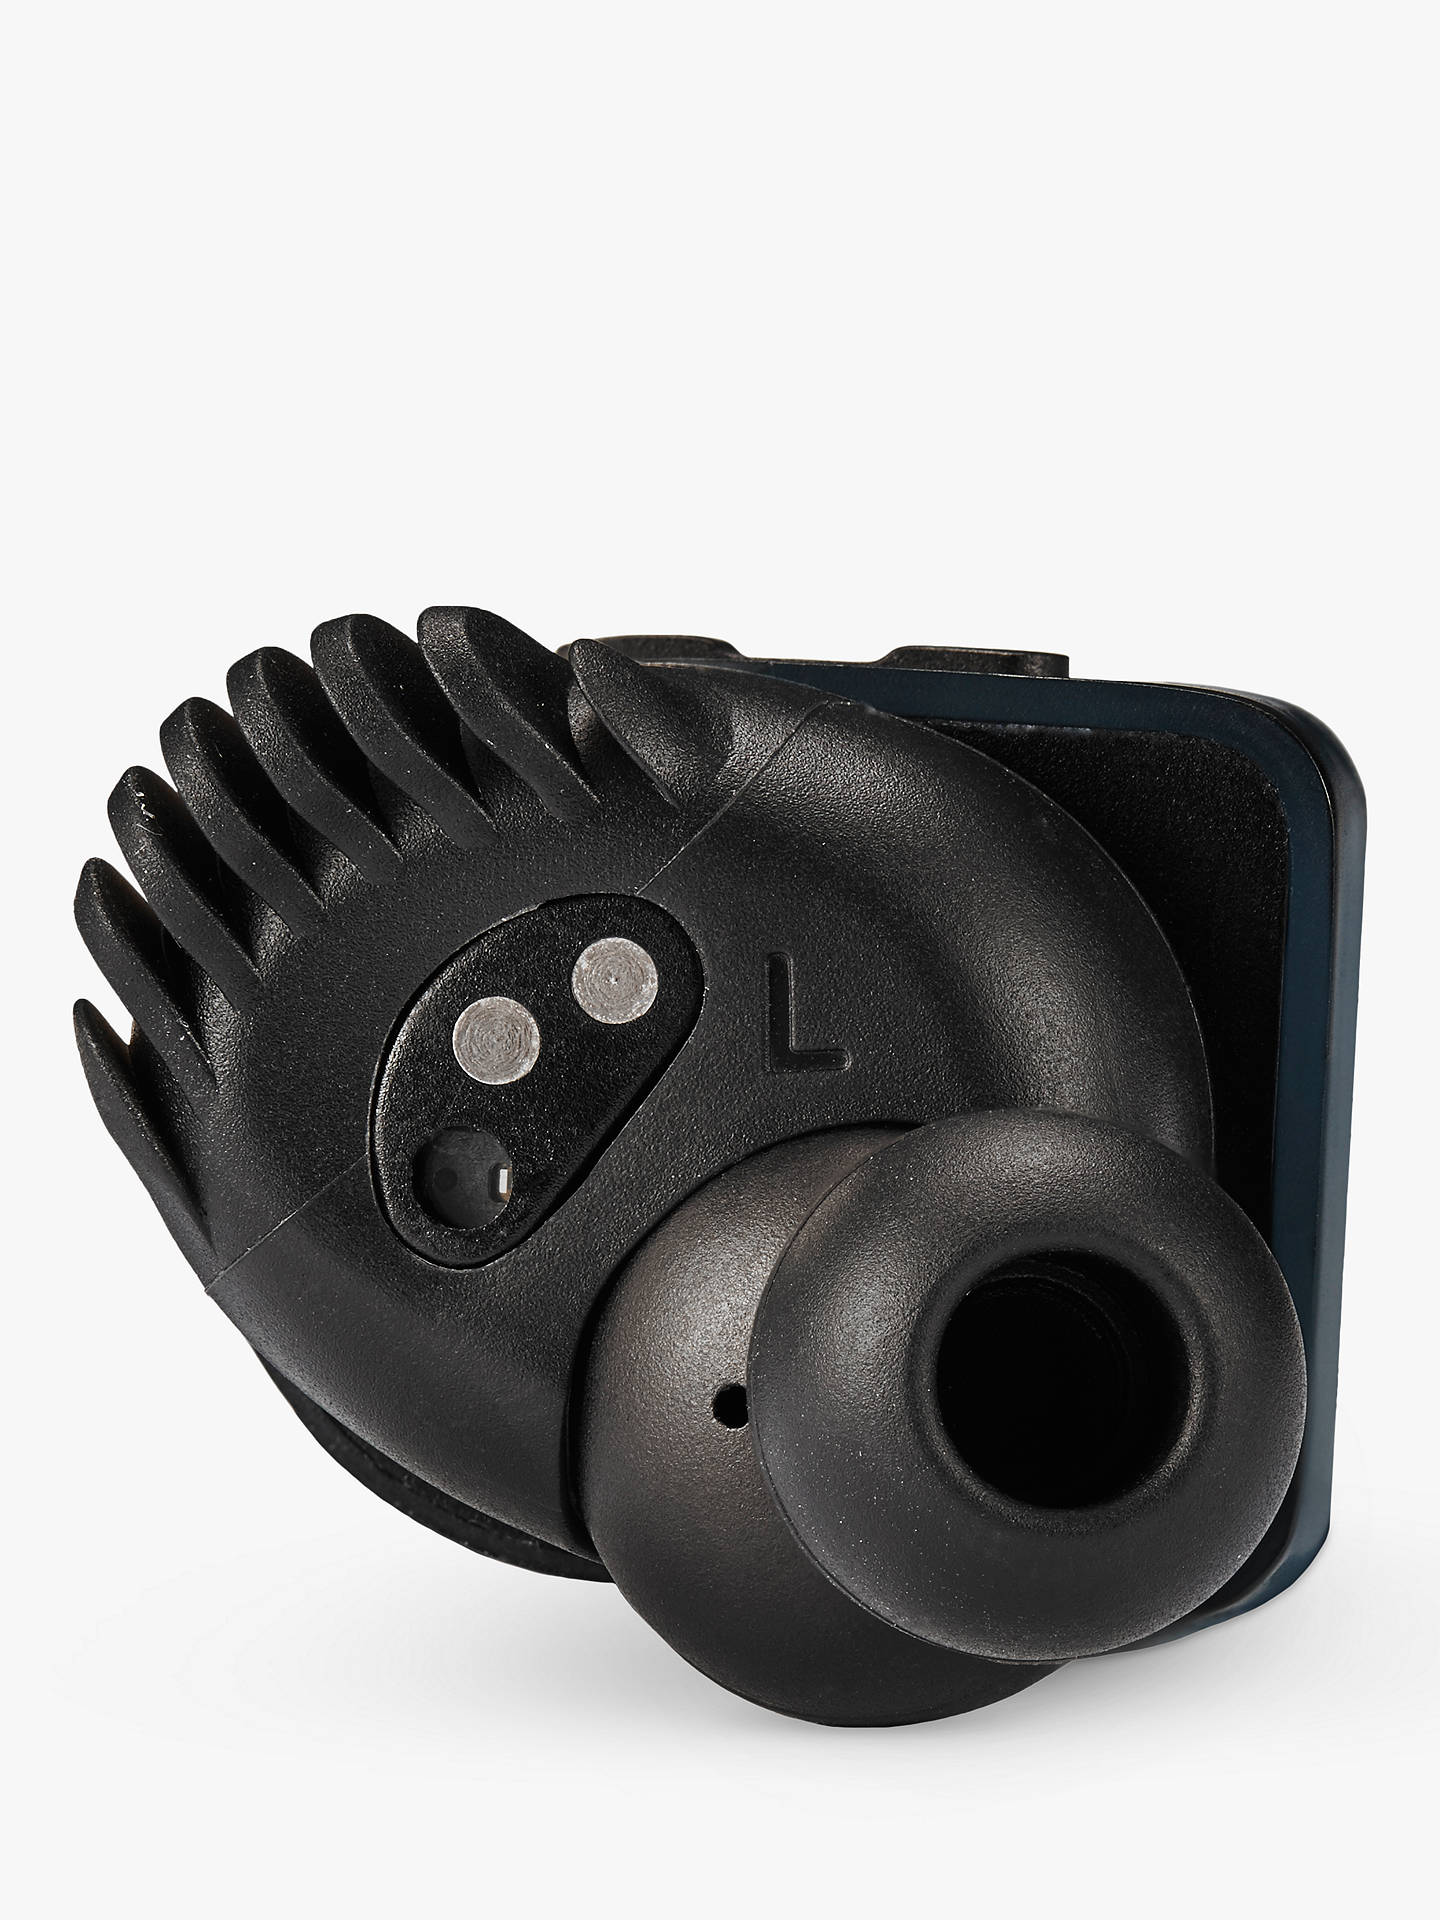 1545b0b191b ... Buy Master & Dynamic MW07 True Wireless Bluetooth In-Ear Headphones  with Mic/Remote ...